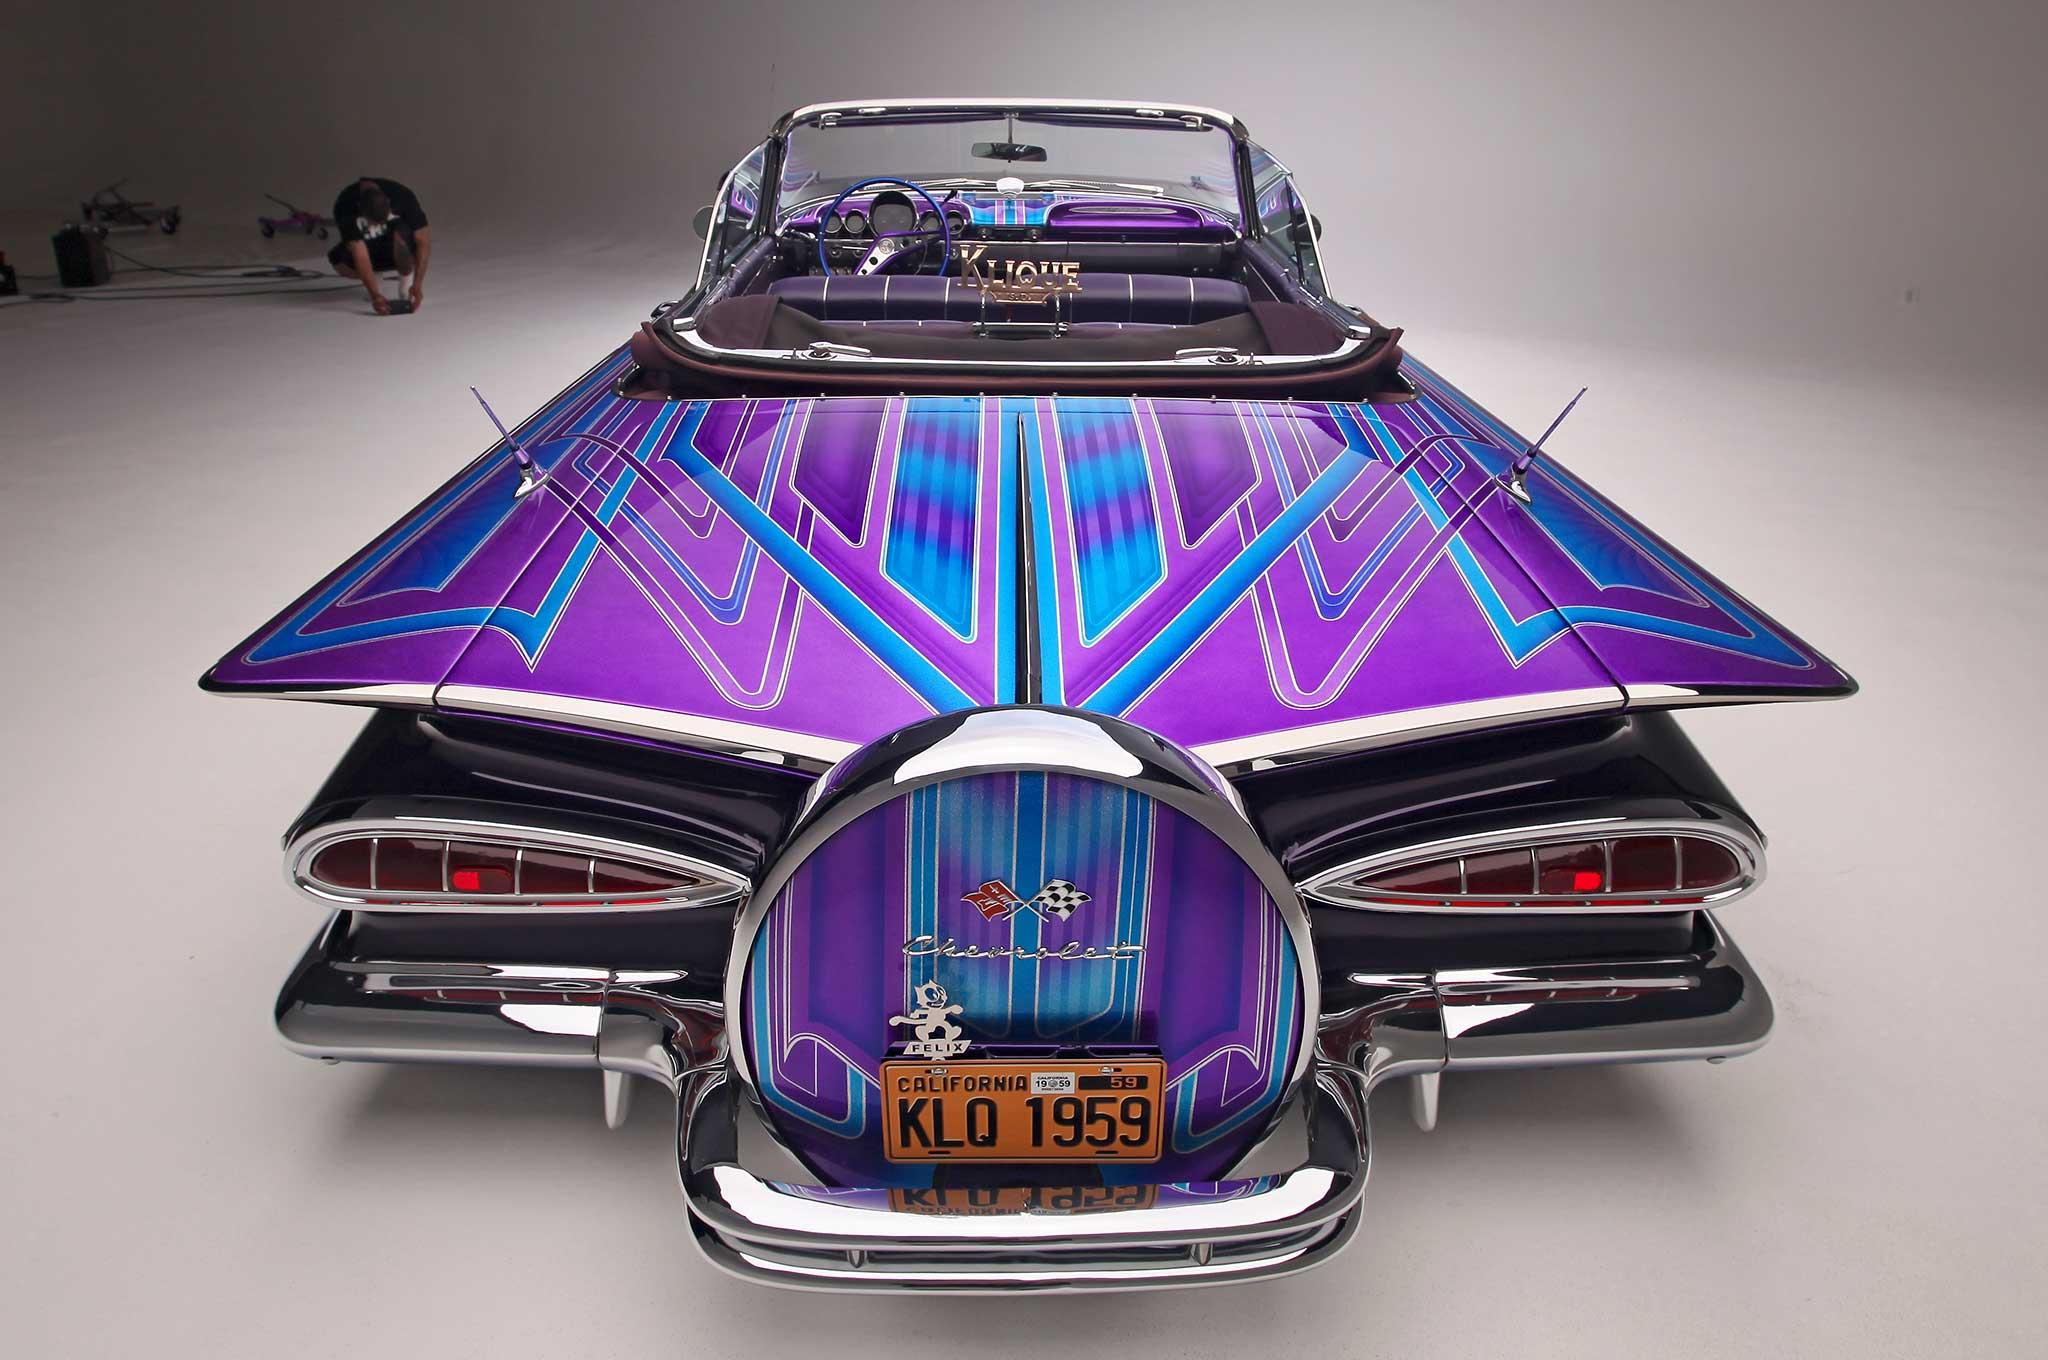 013 1959 chevrolet impala convertible rear bumper